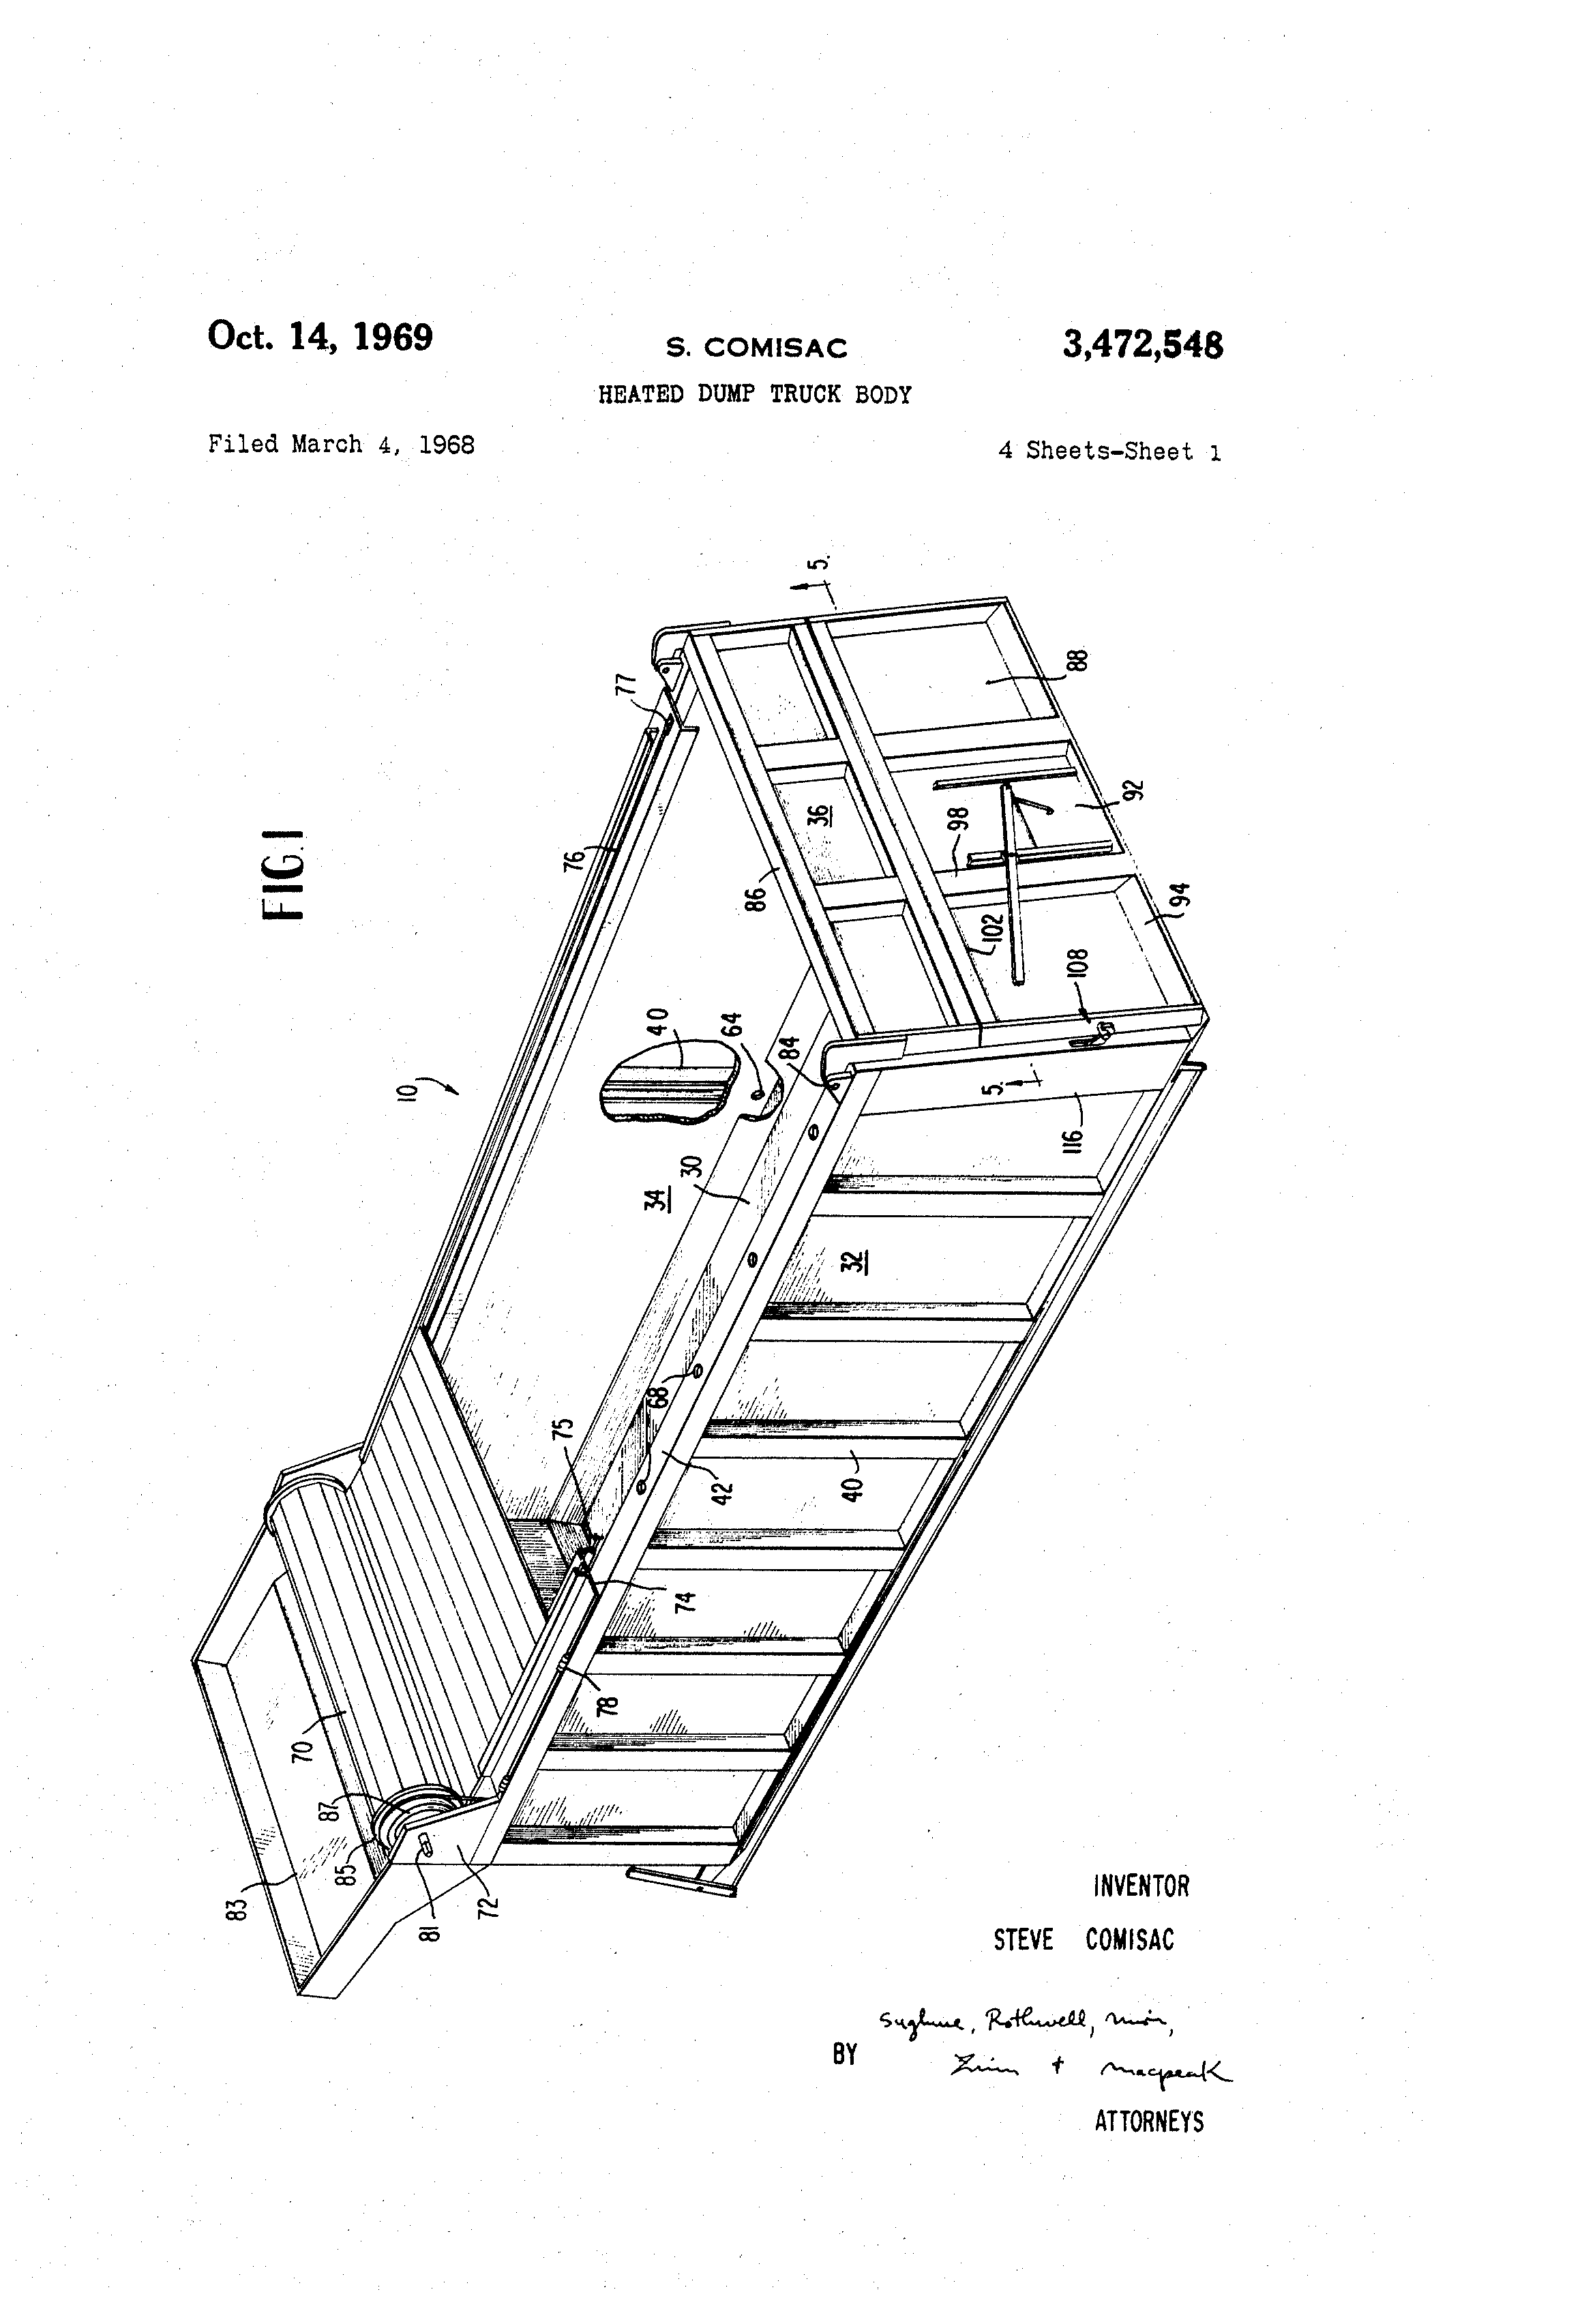 patent us3472548 - heated dump truck body - google patents